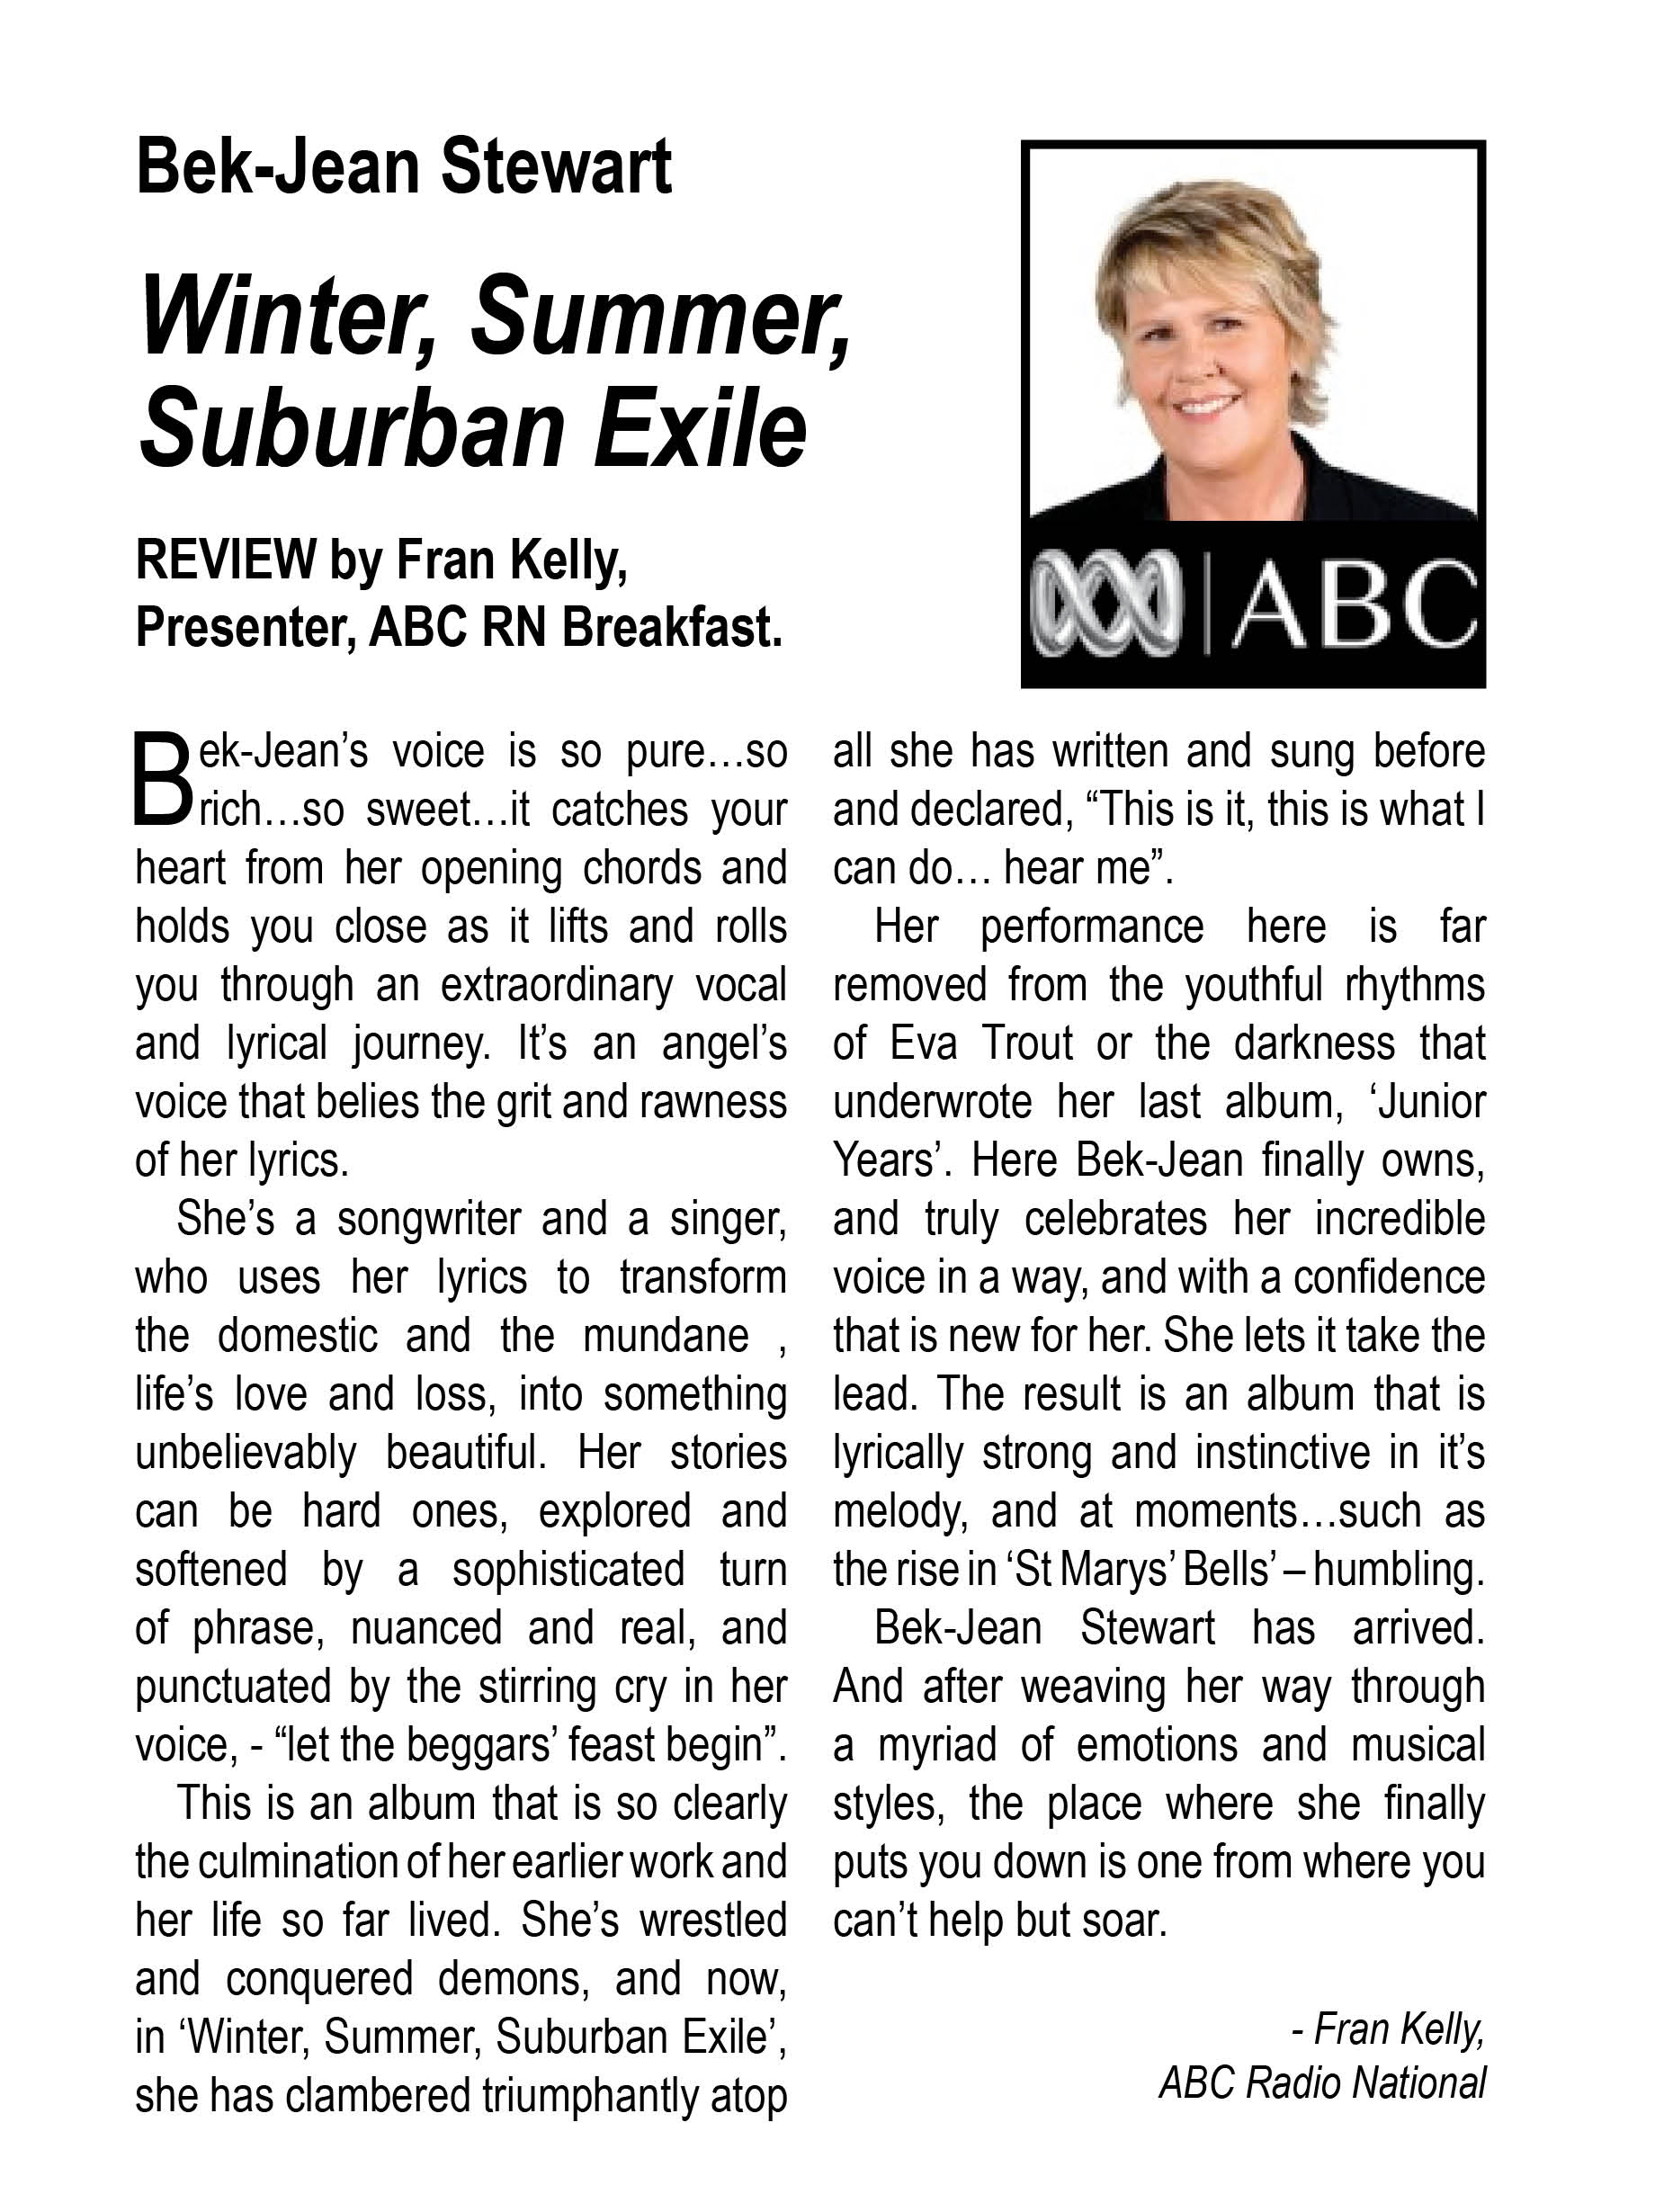 Fran Kelly WSSE review cropped.jpg